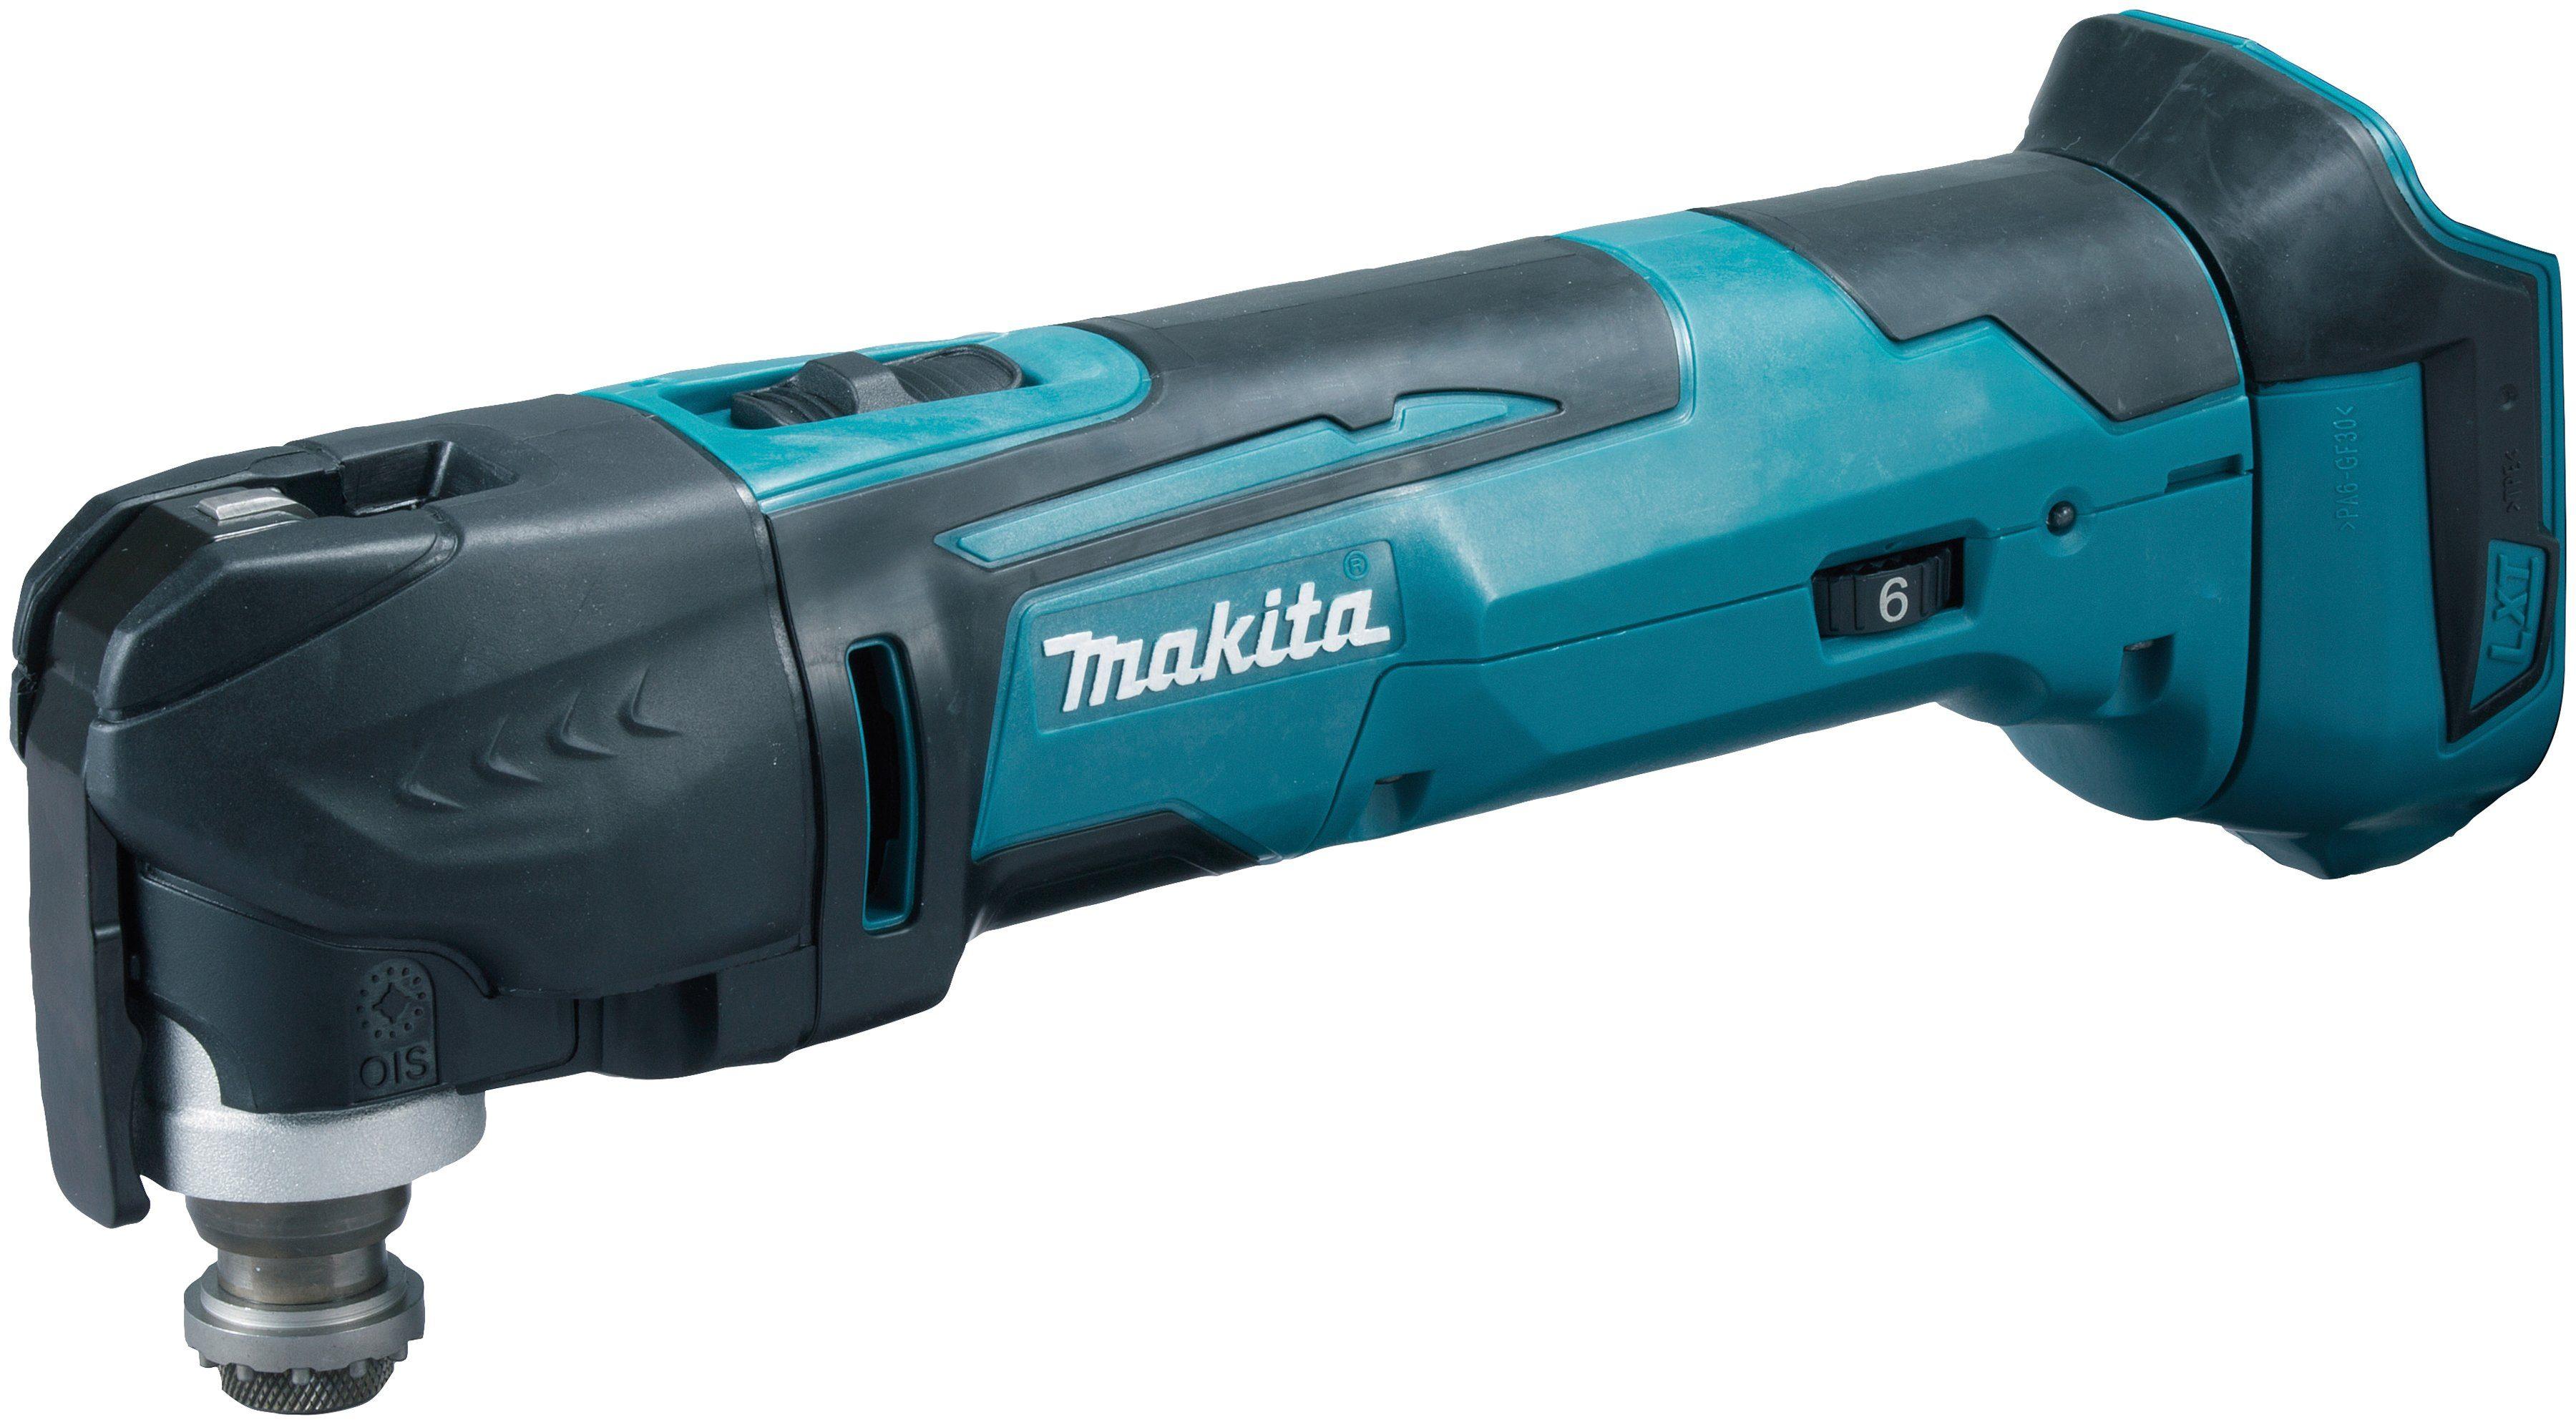 MAKITA Akku-Multifunktionswerkzeug »DTM41Y1JX3«, 14,4 V, inkl. 40-tgl. Werkzeug-Box